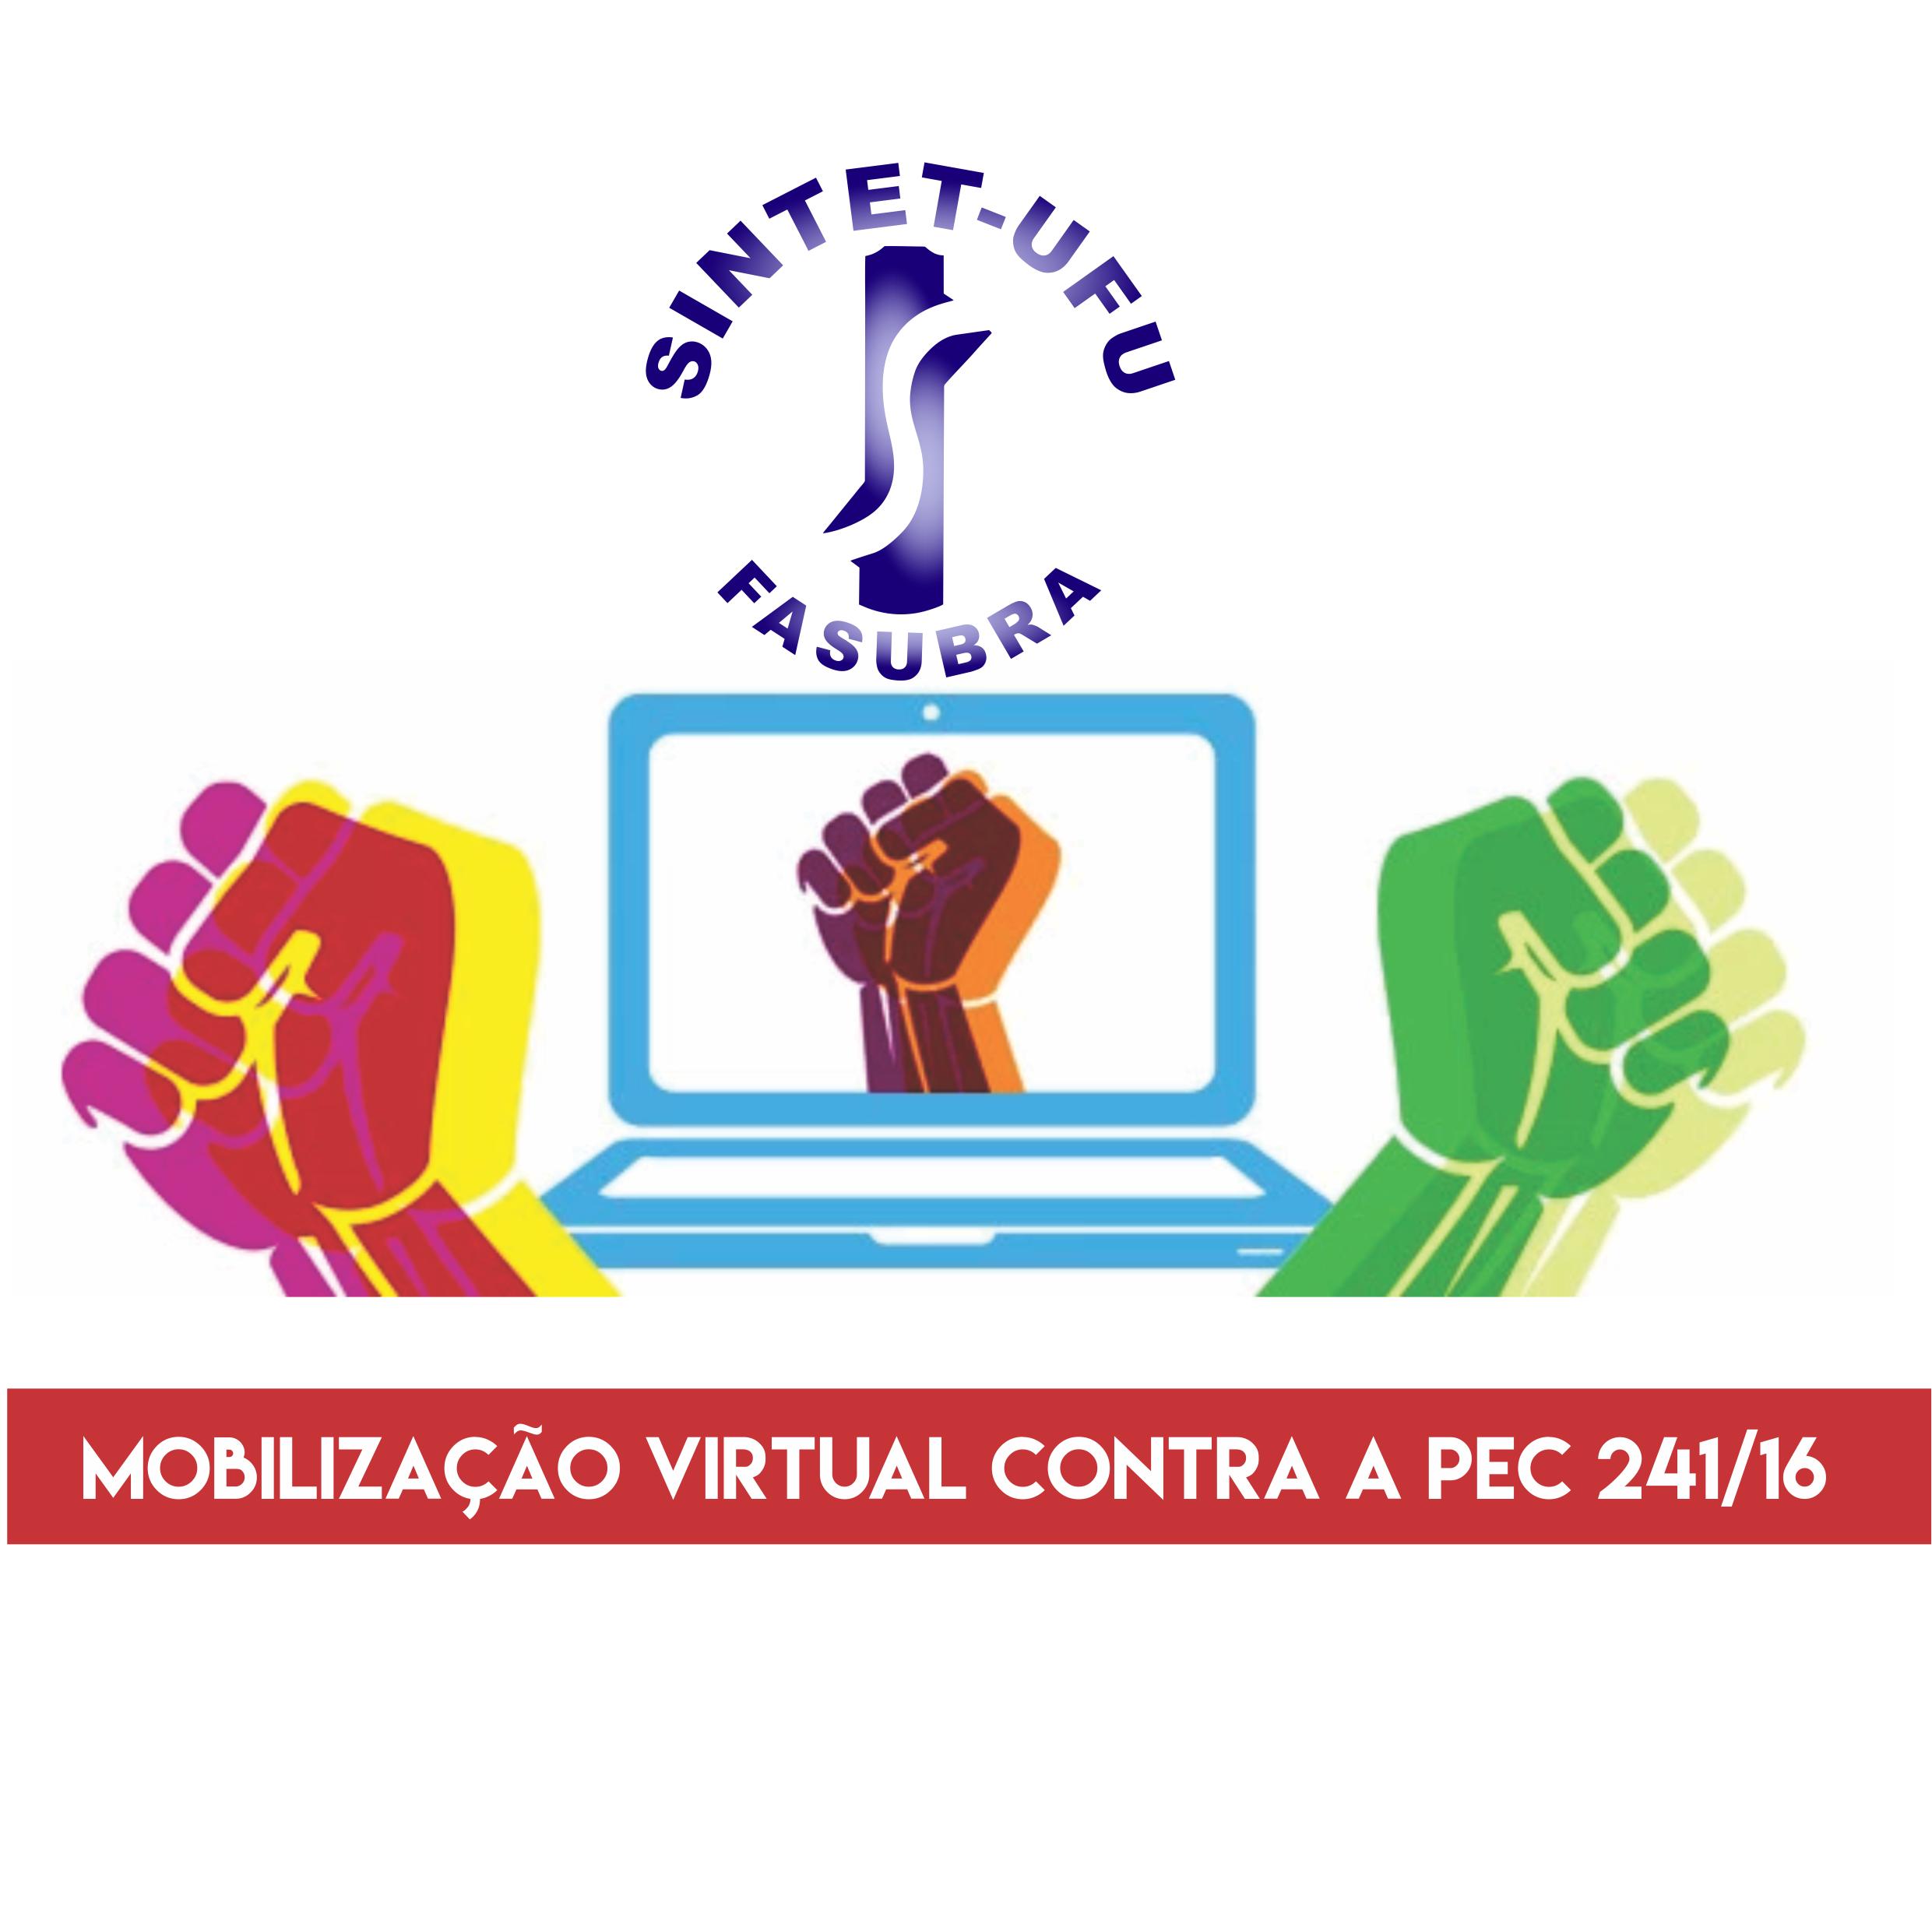 mobilizacao-virtual